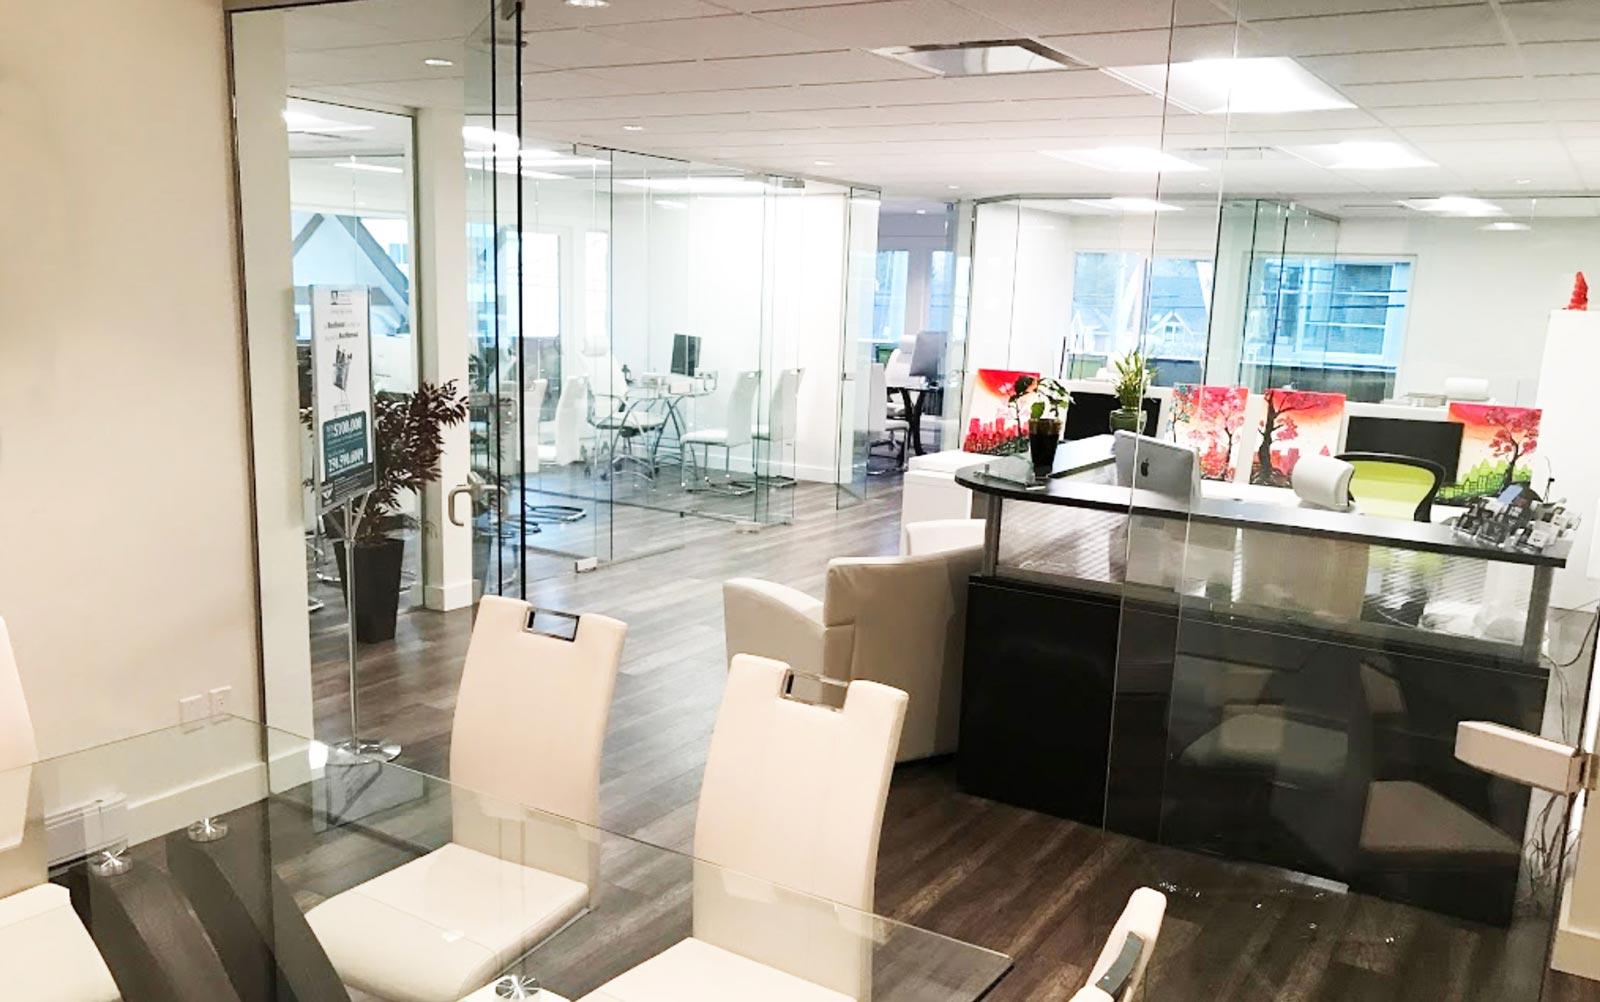 Image of the Cutting Edge Lending Oak Bay Office